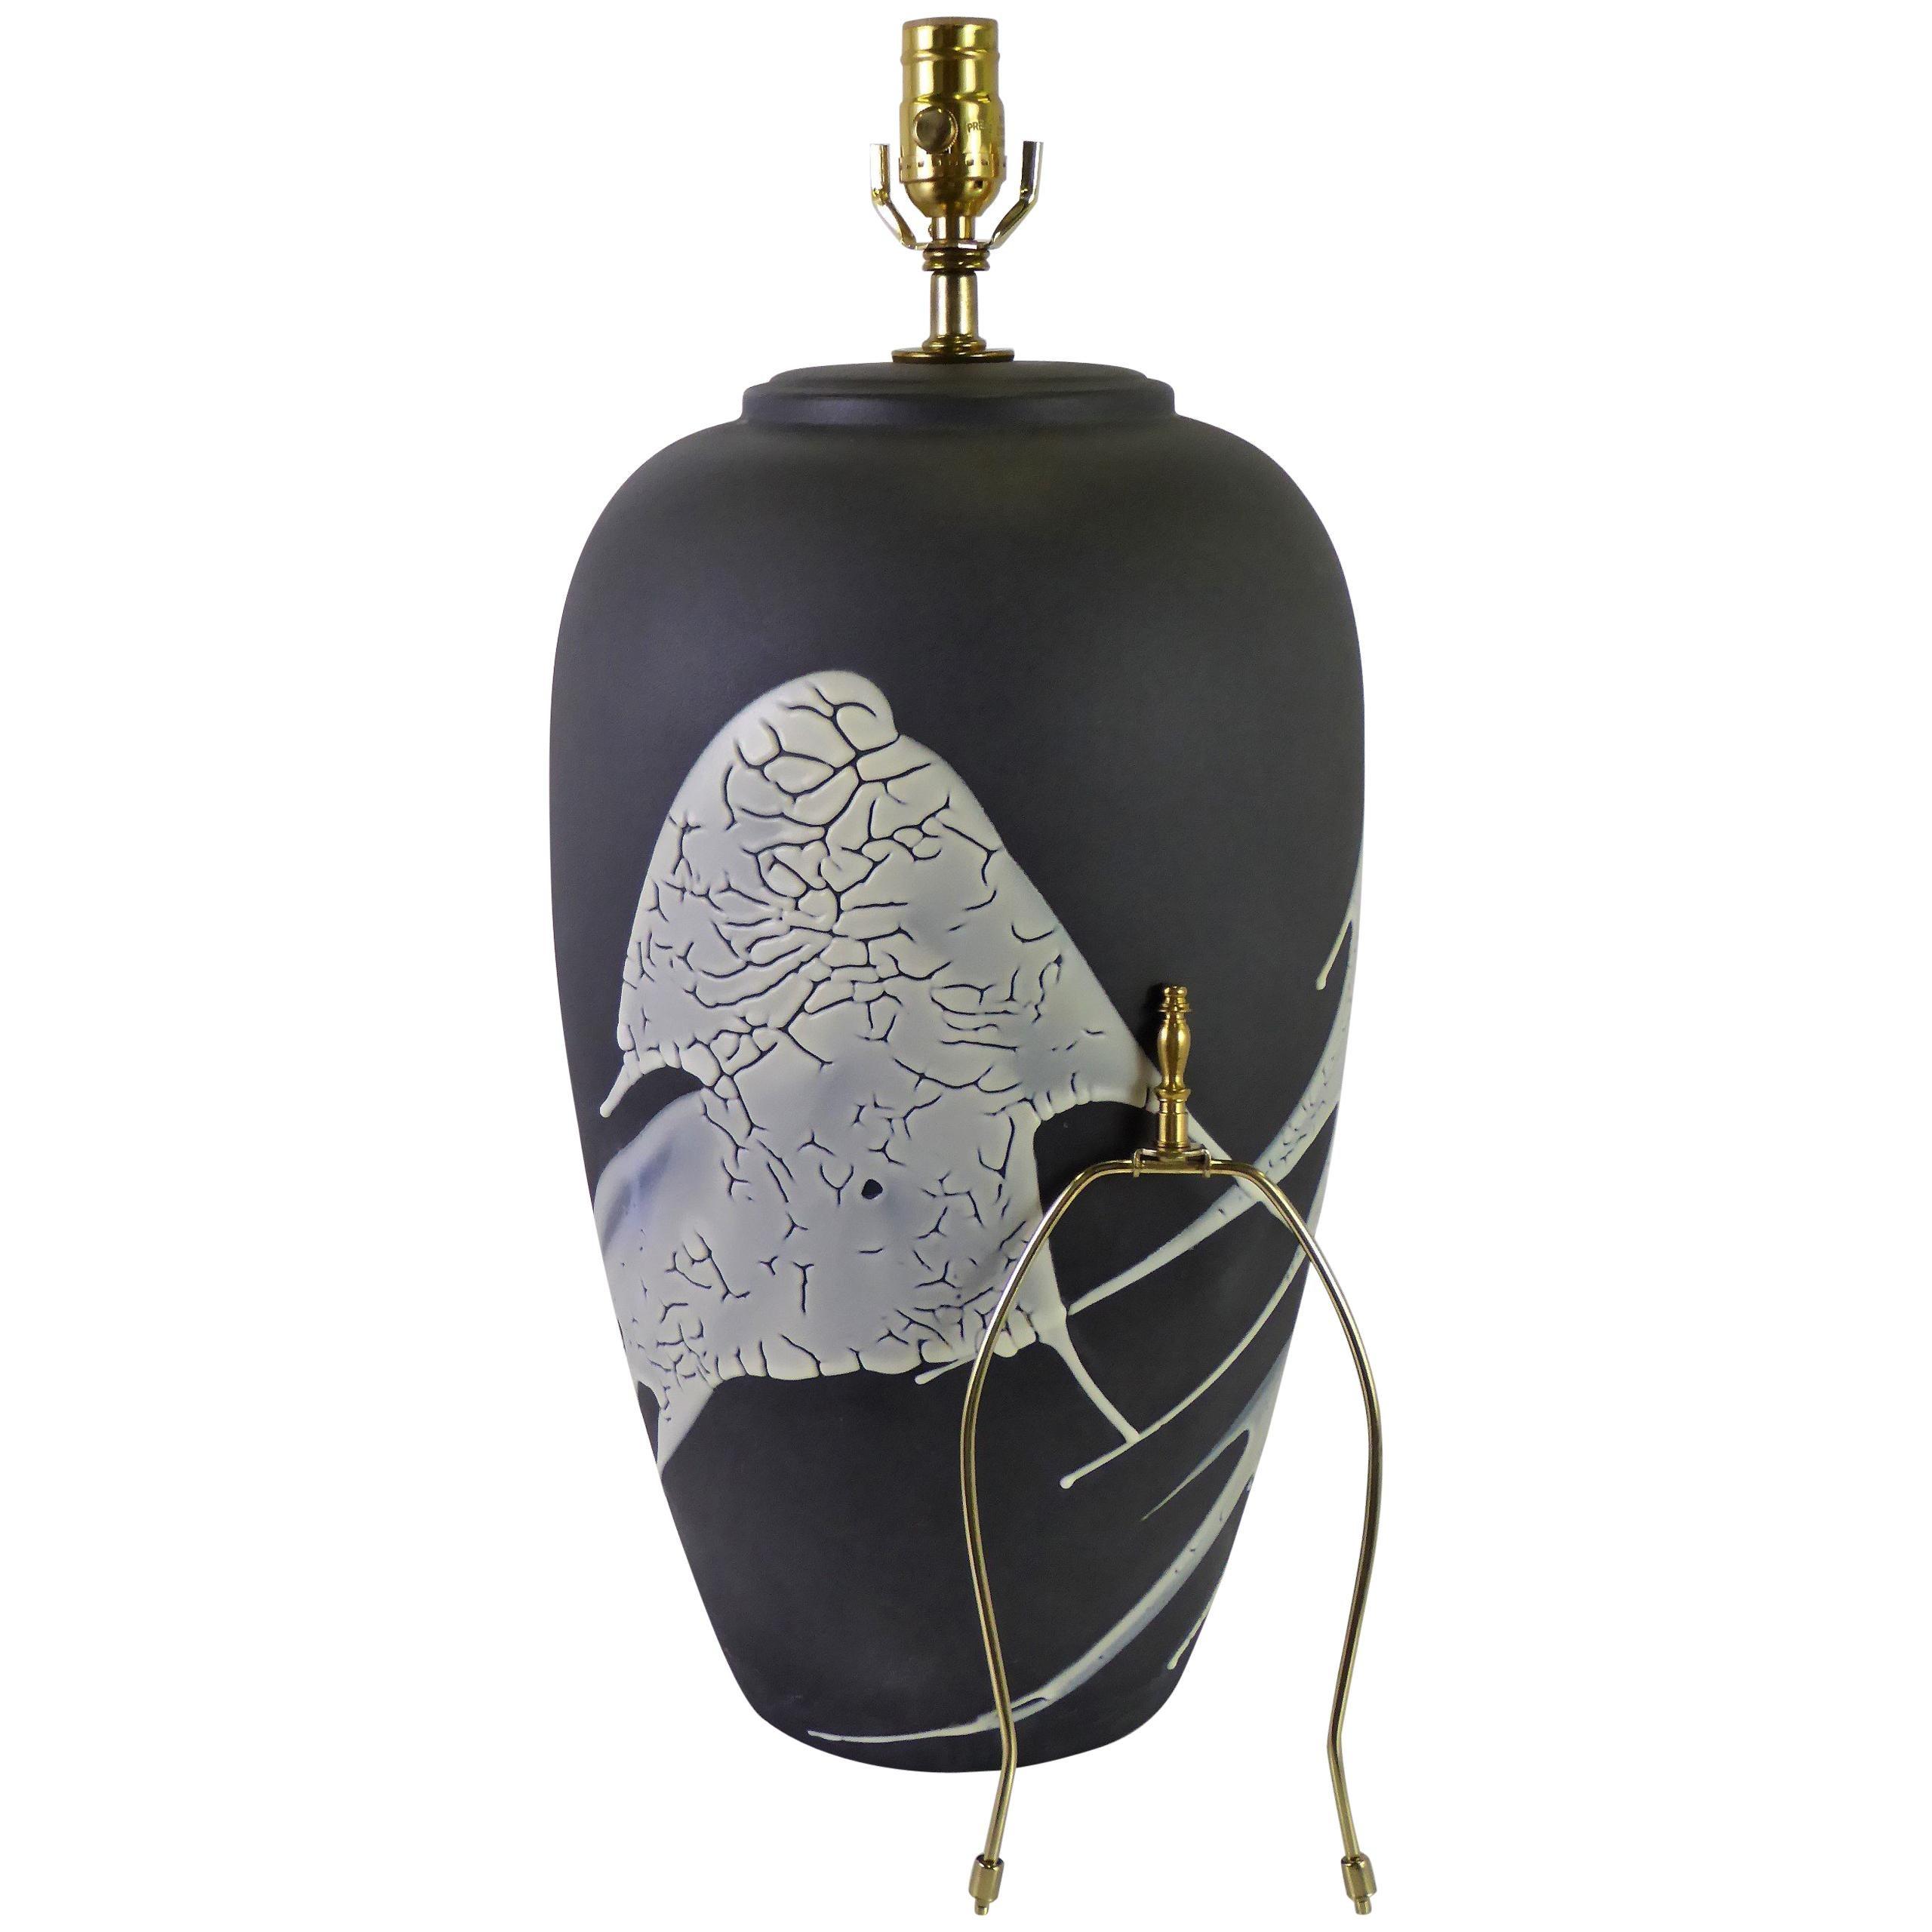 1960s Black n White Lava Glaze Pottery Table Lamp